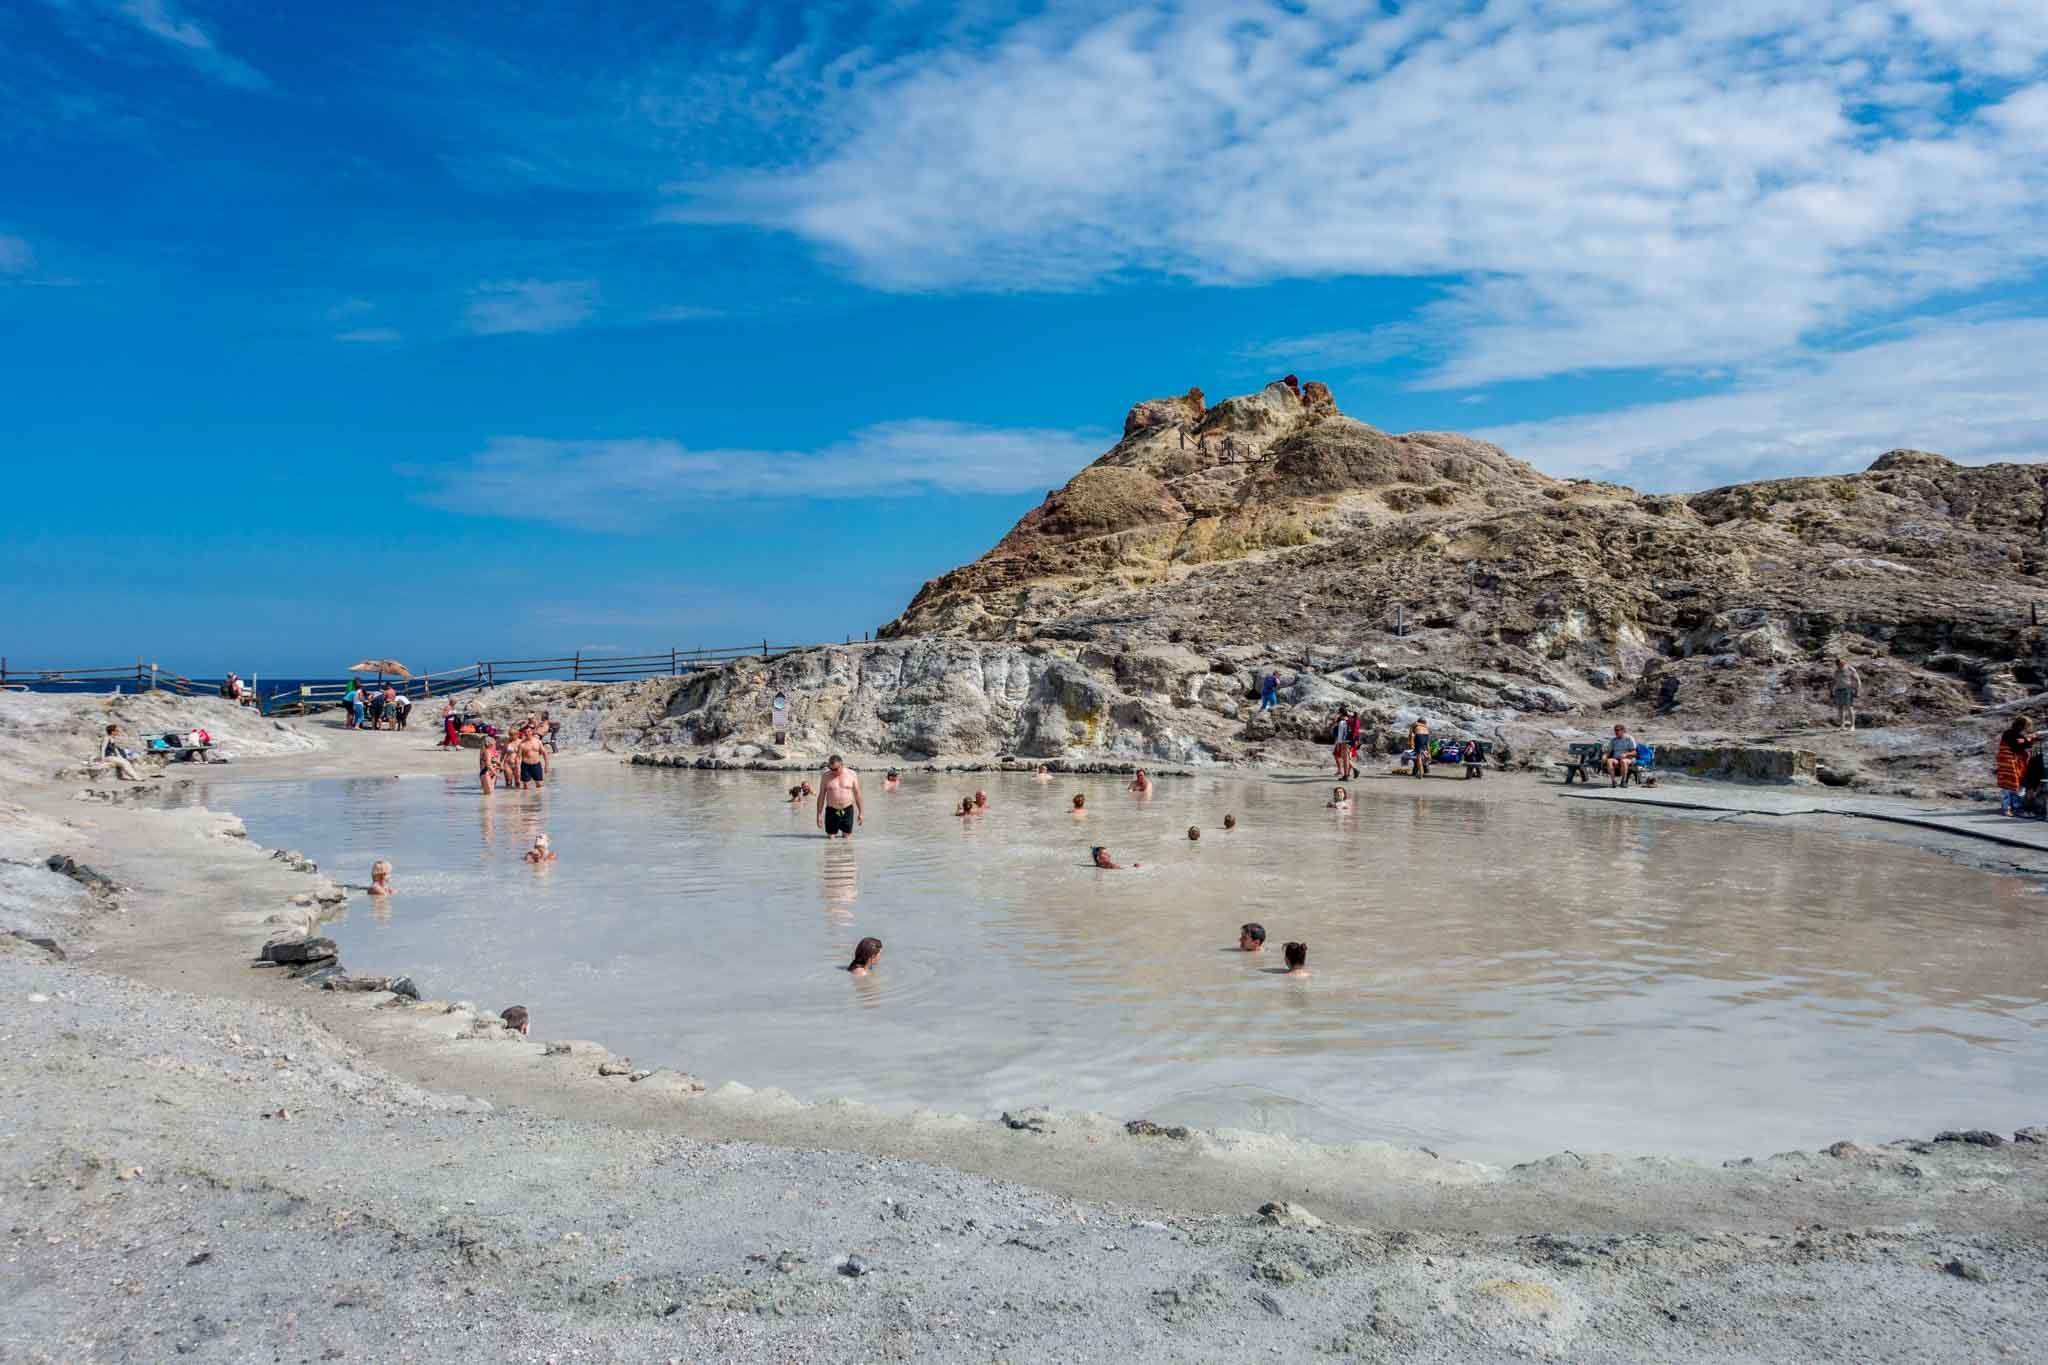 People in mud baths on the Aeolian island of Vulcano